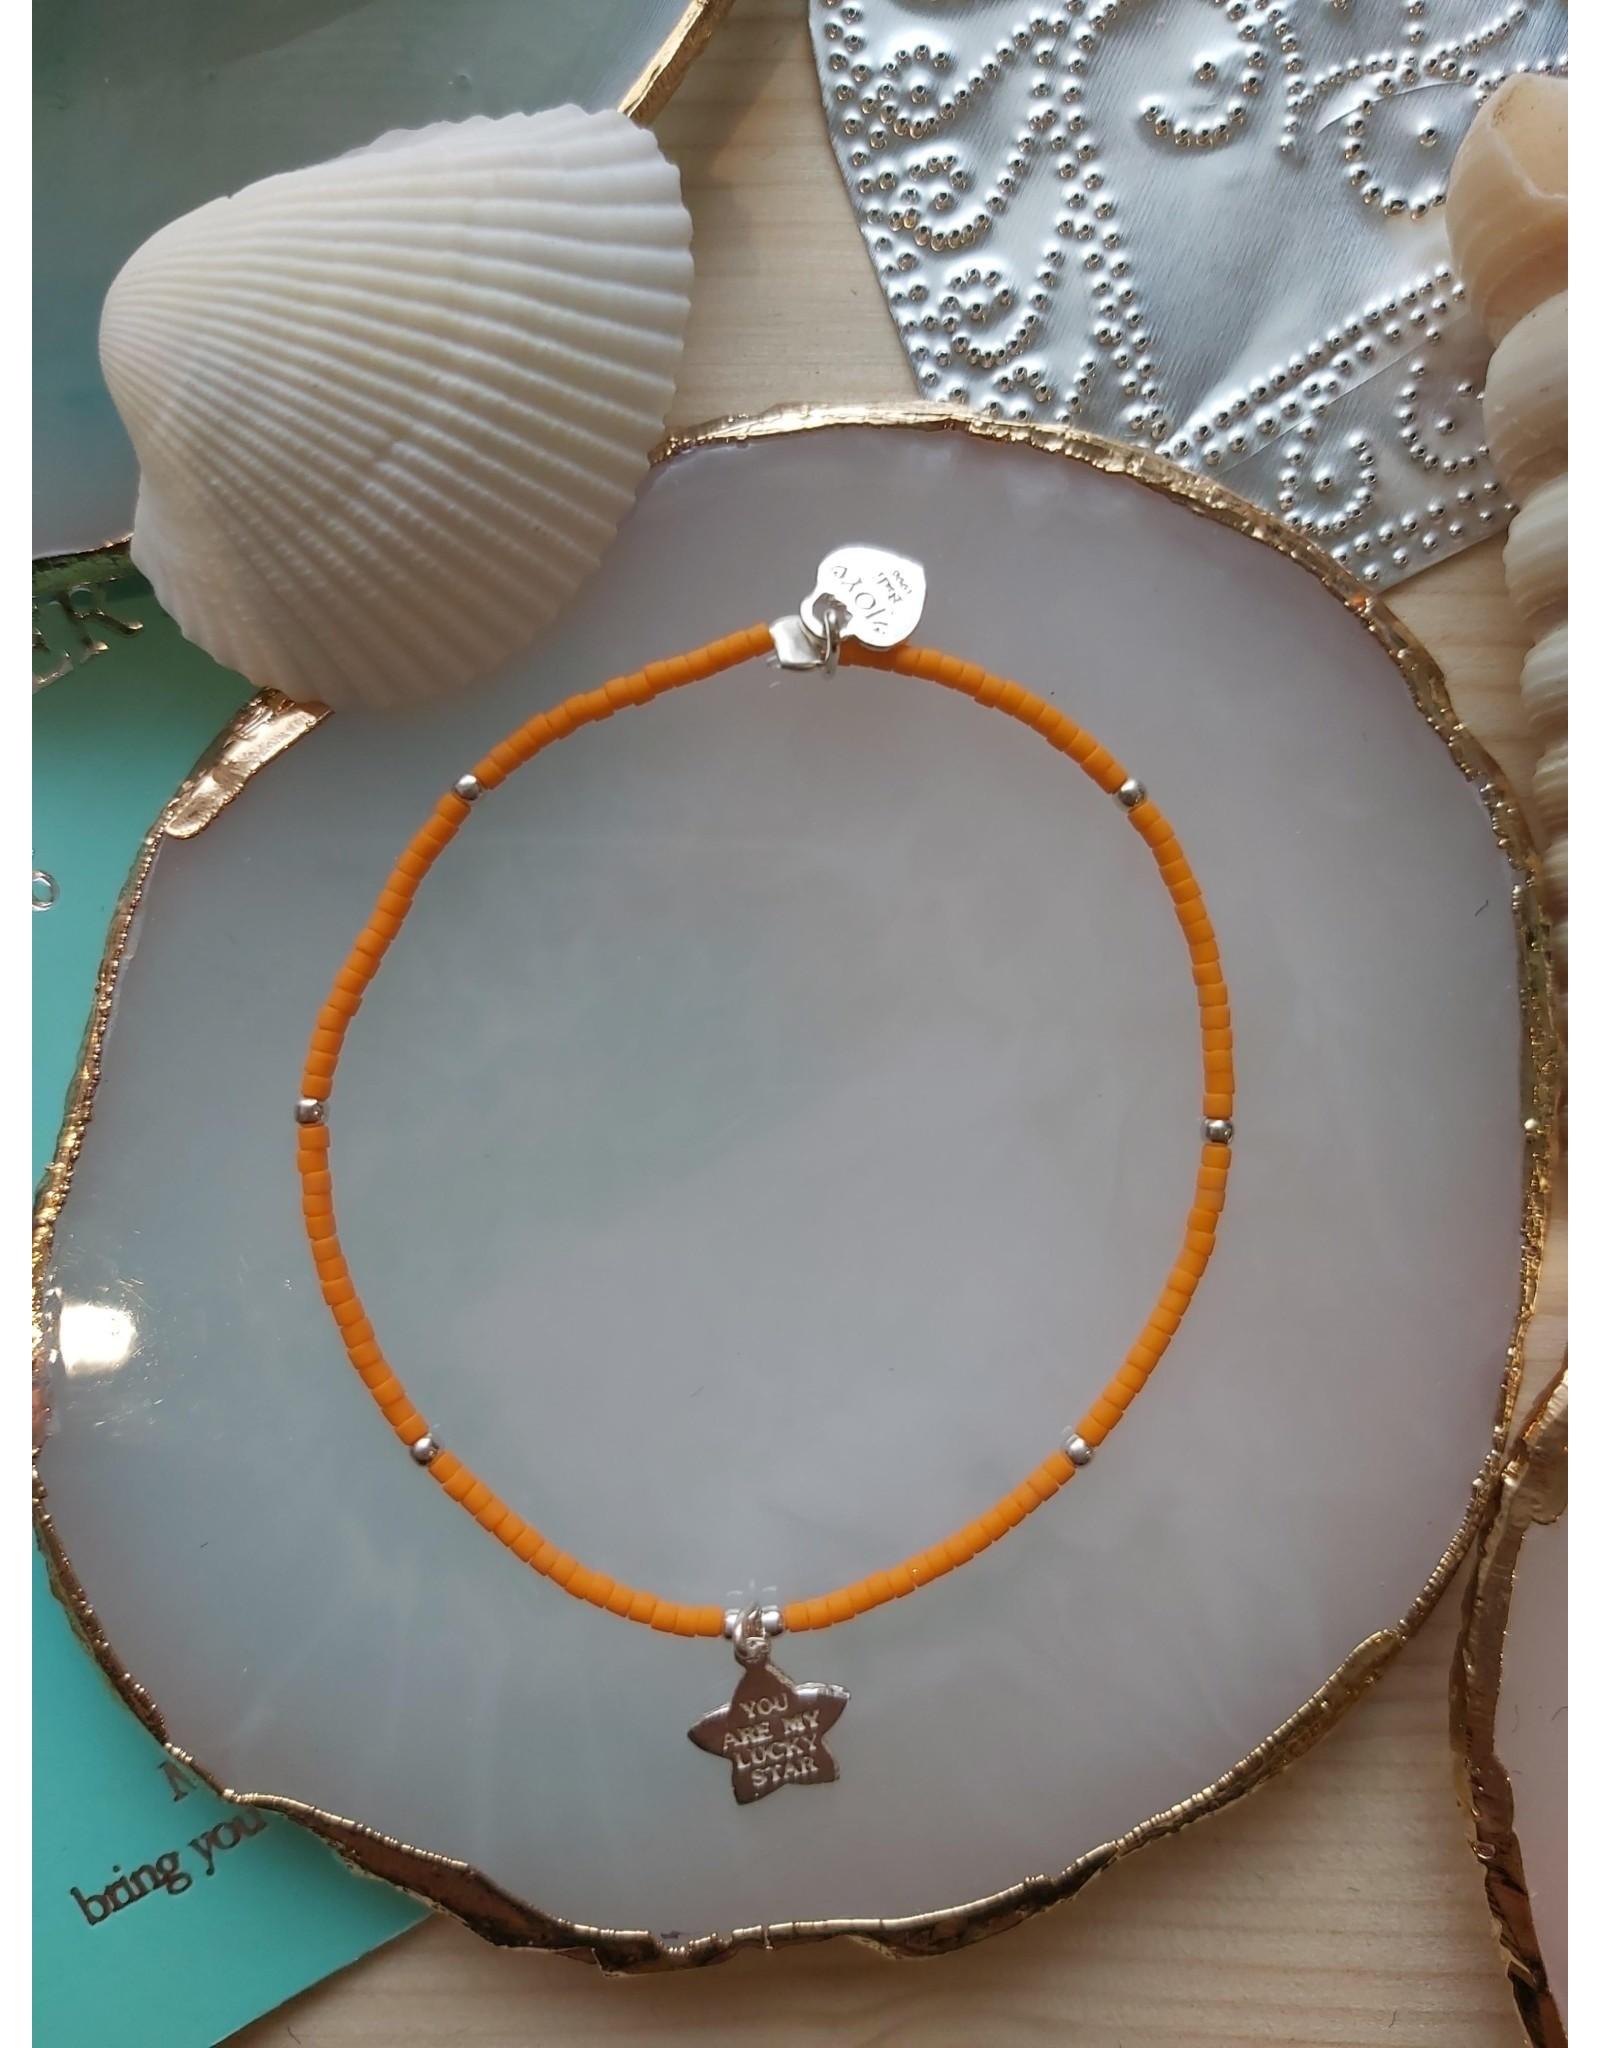 Joy Bali JOY Jamaica armband oranje lucky star